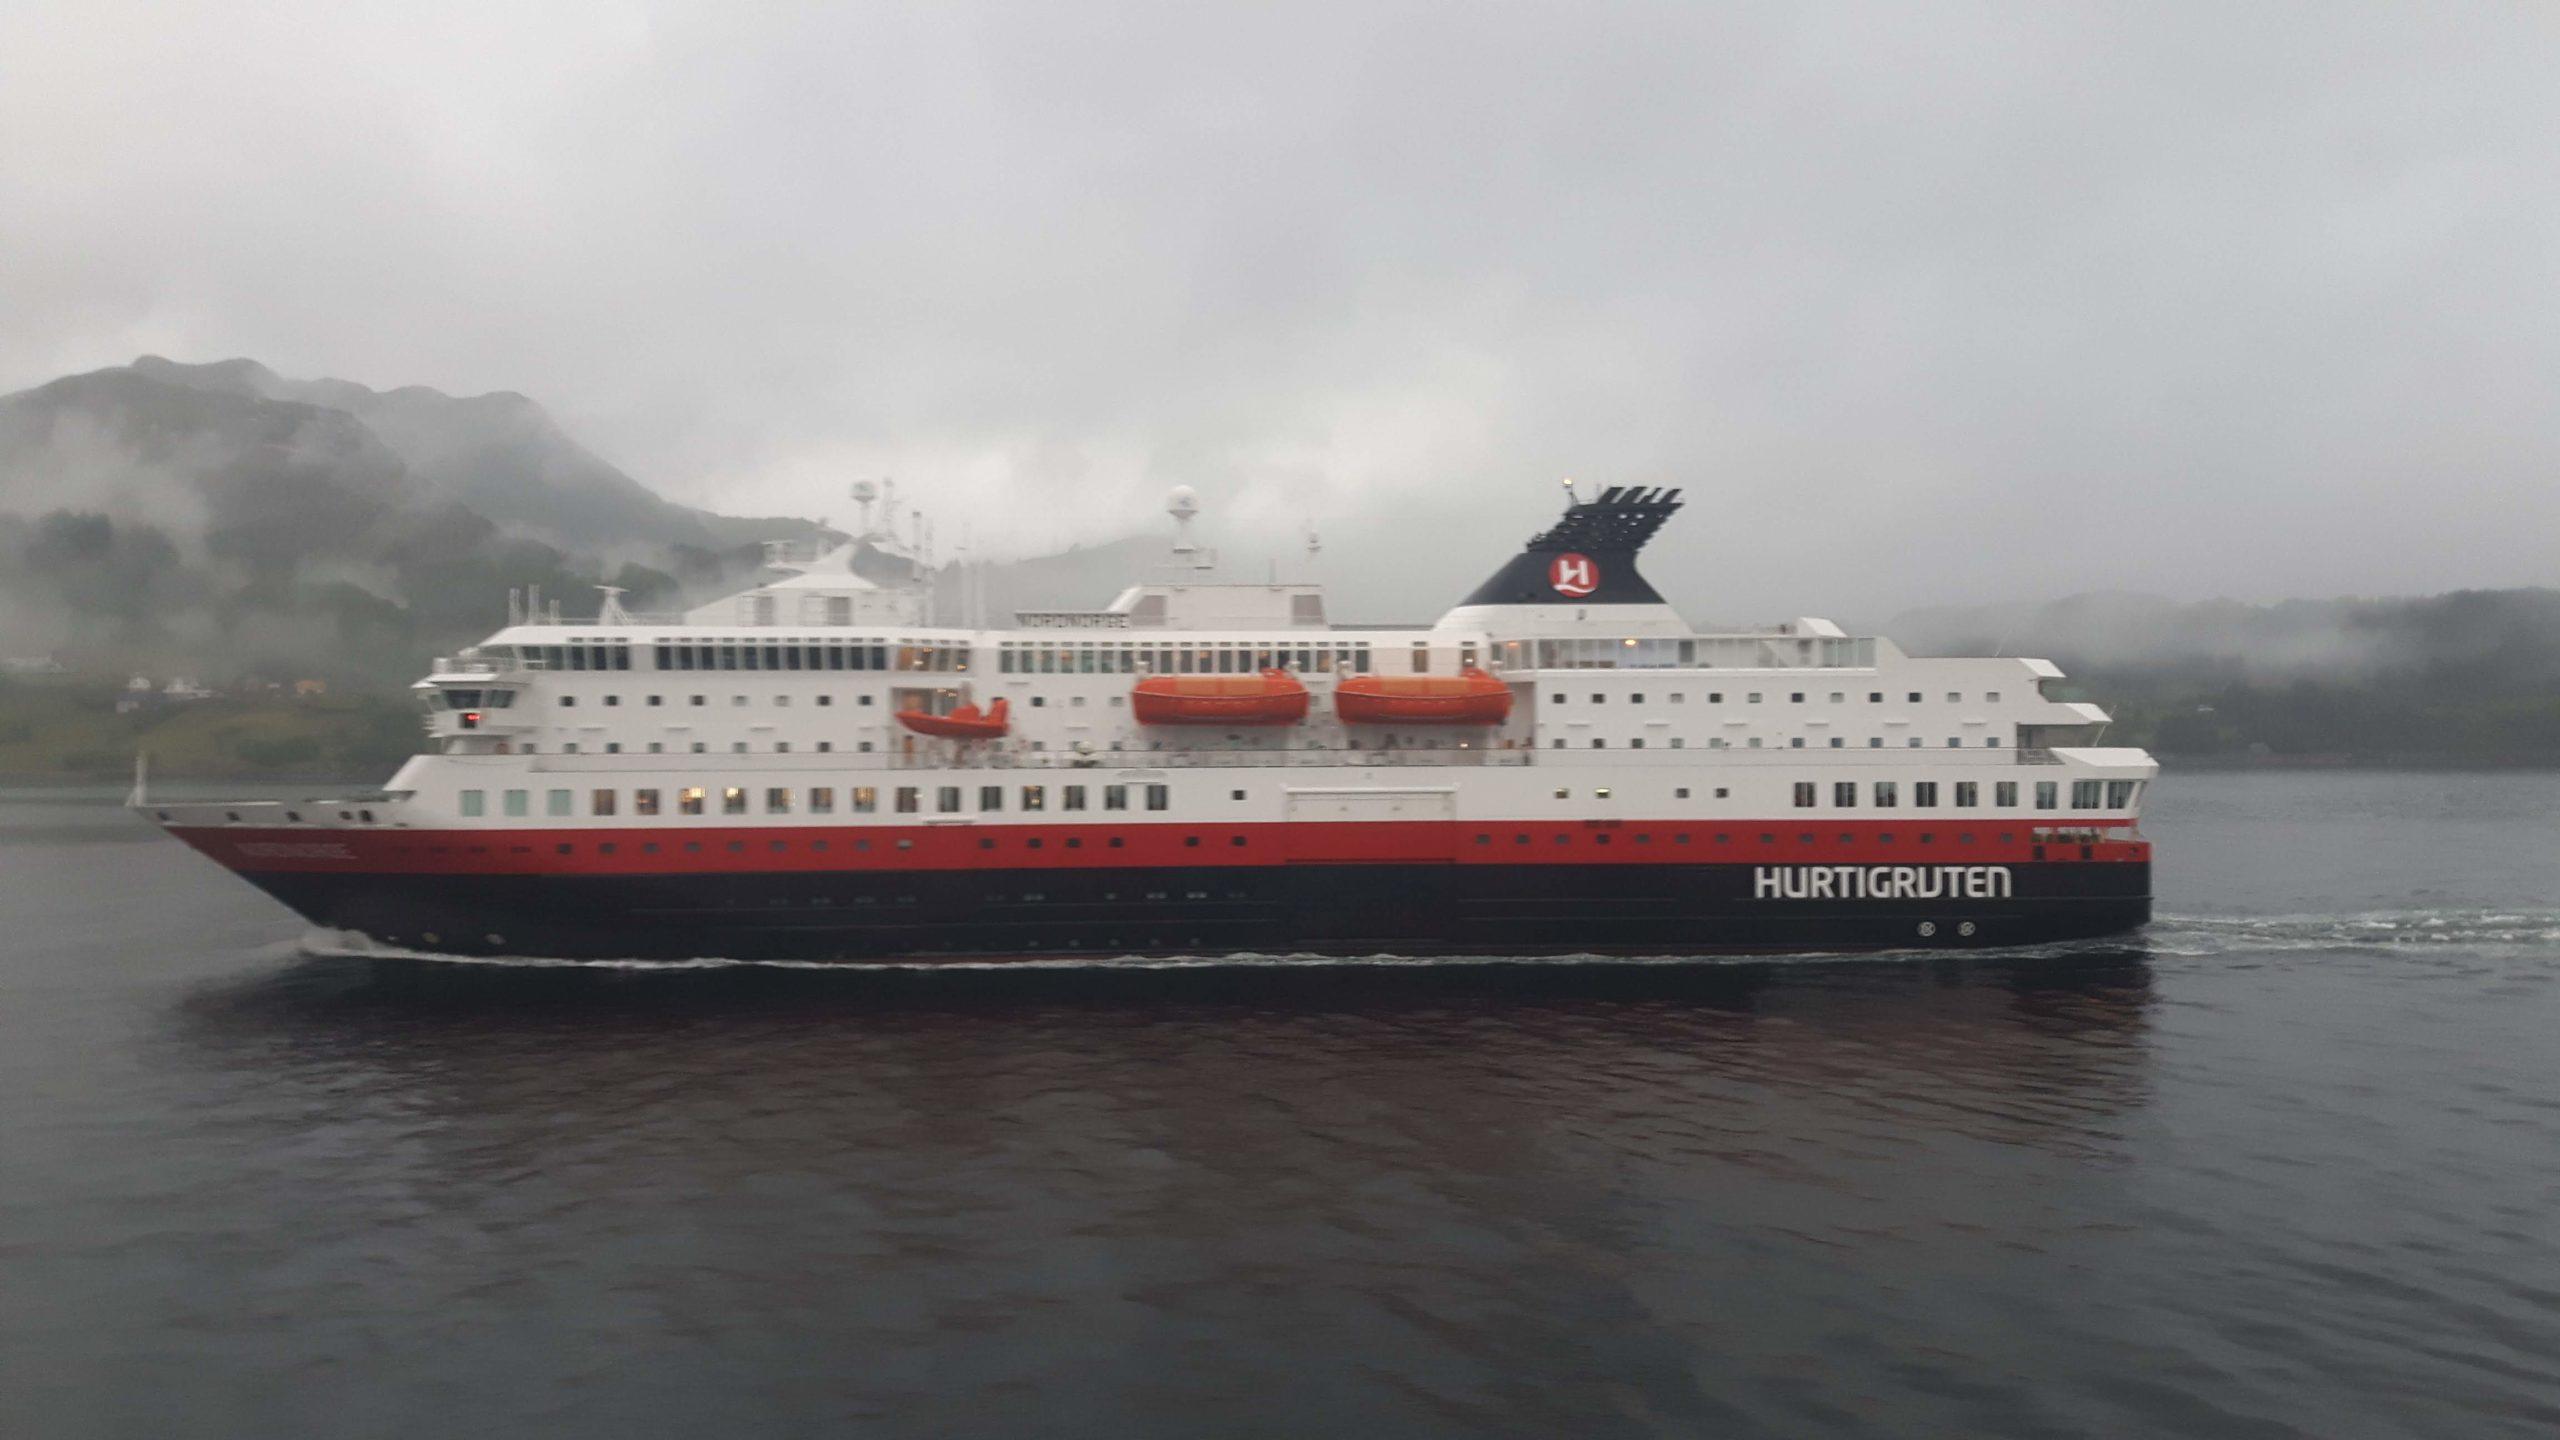 Another Hurtigruten Ship on route